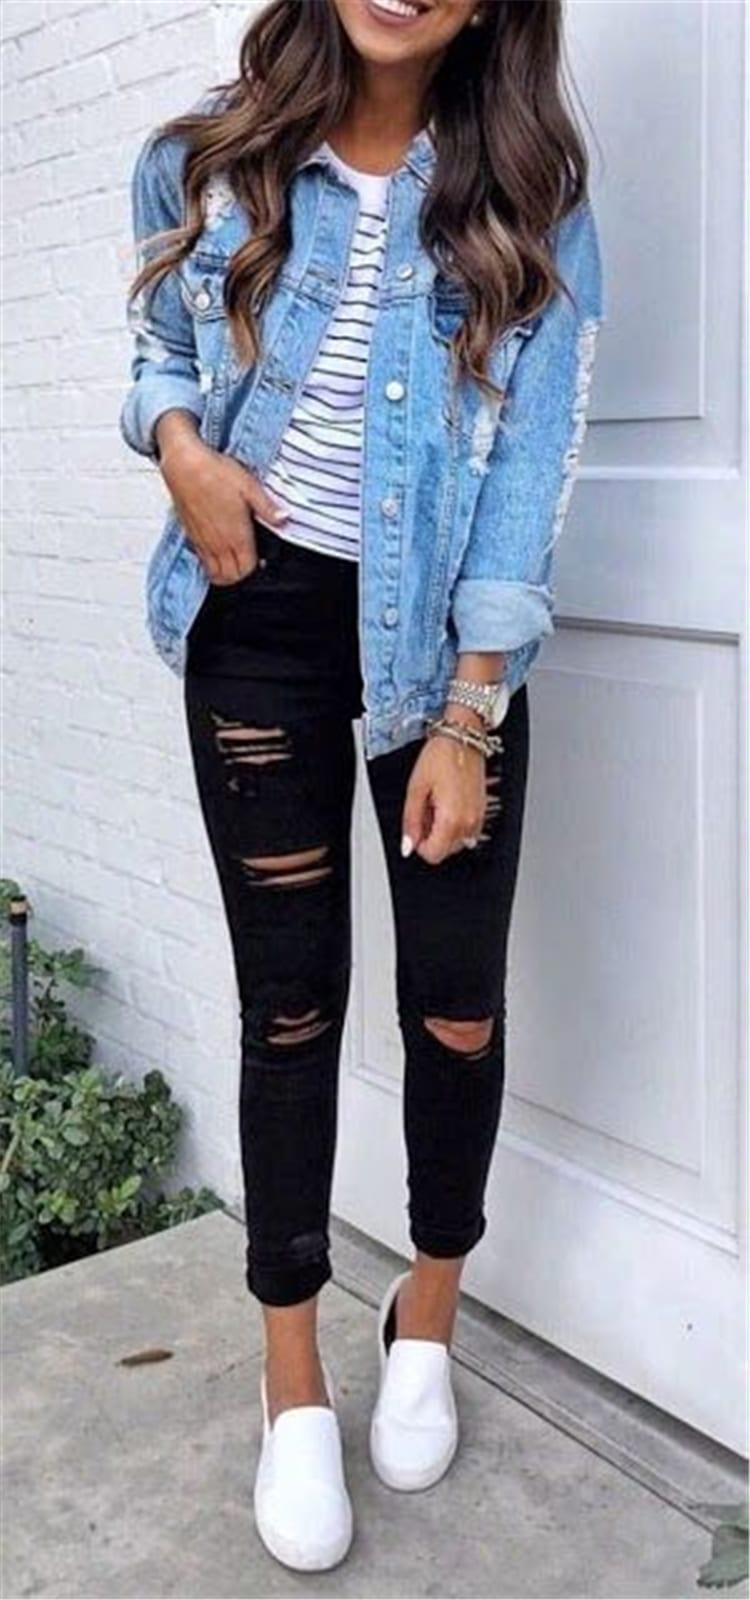 ropa de moda para chicas adolescentes